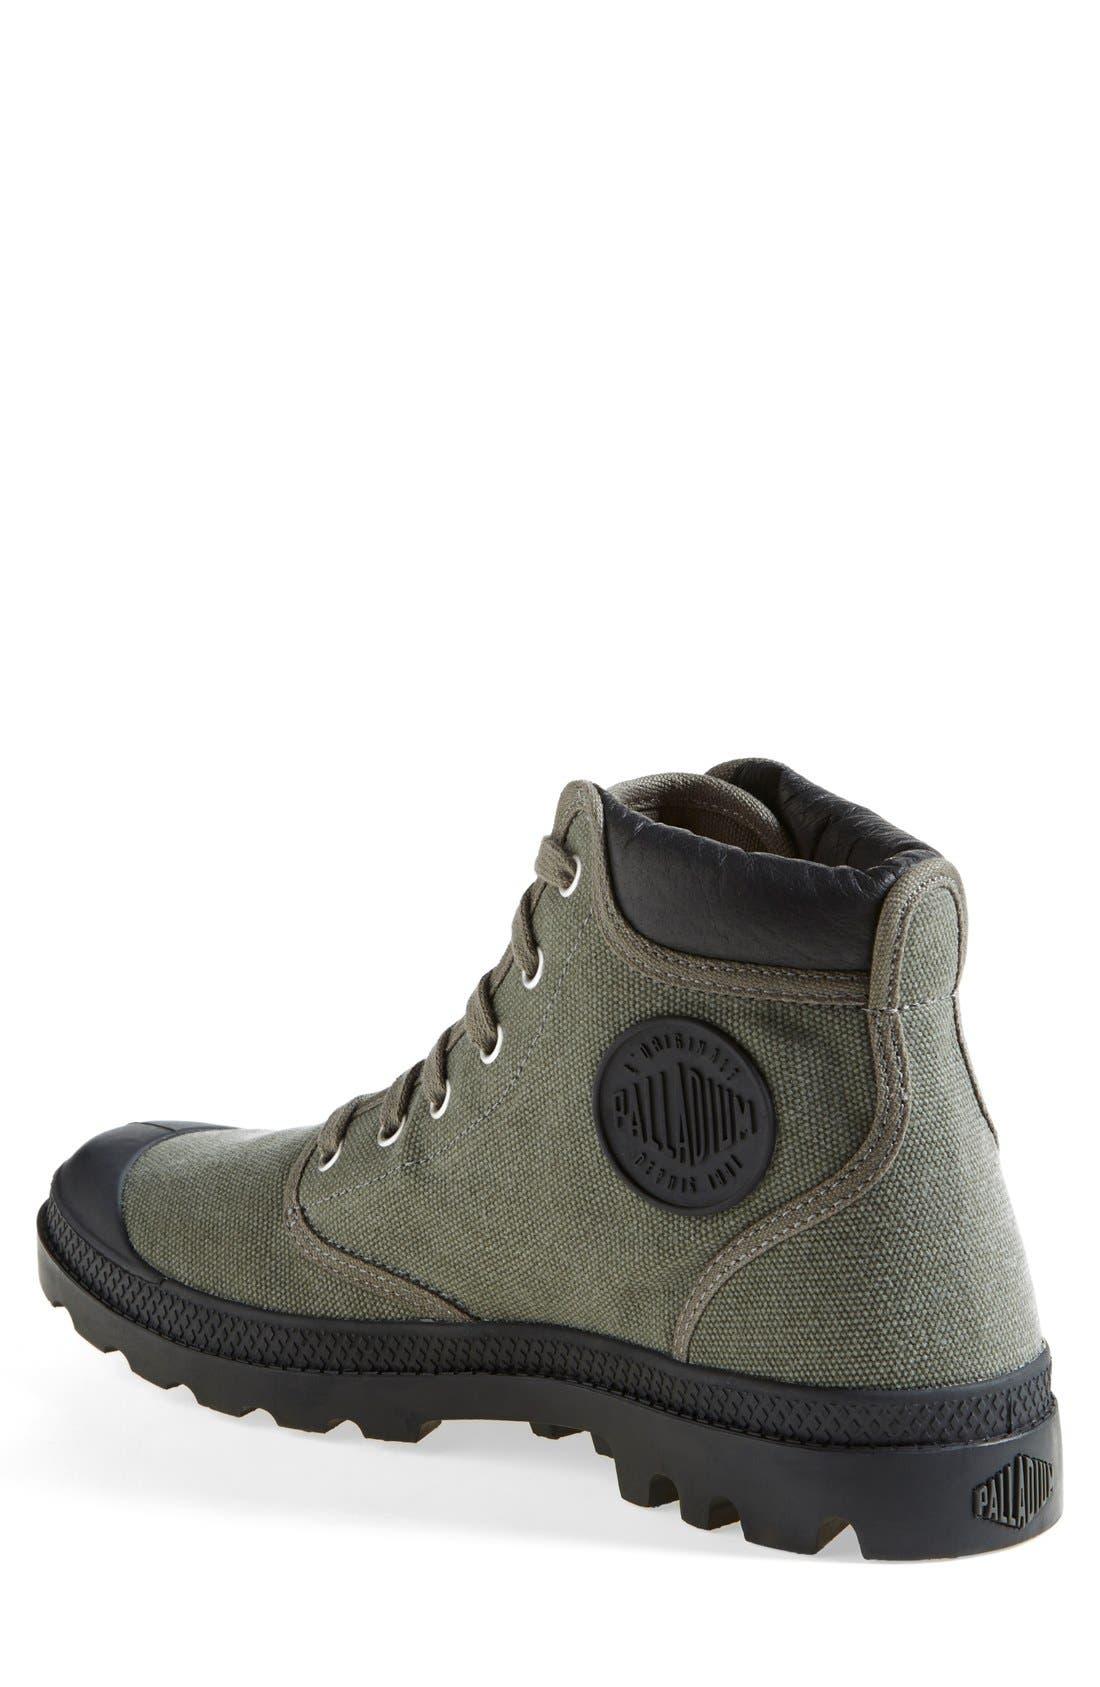 Alternate Image 2  - Palladium 'Pampa Hi' Boot